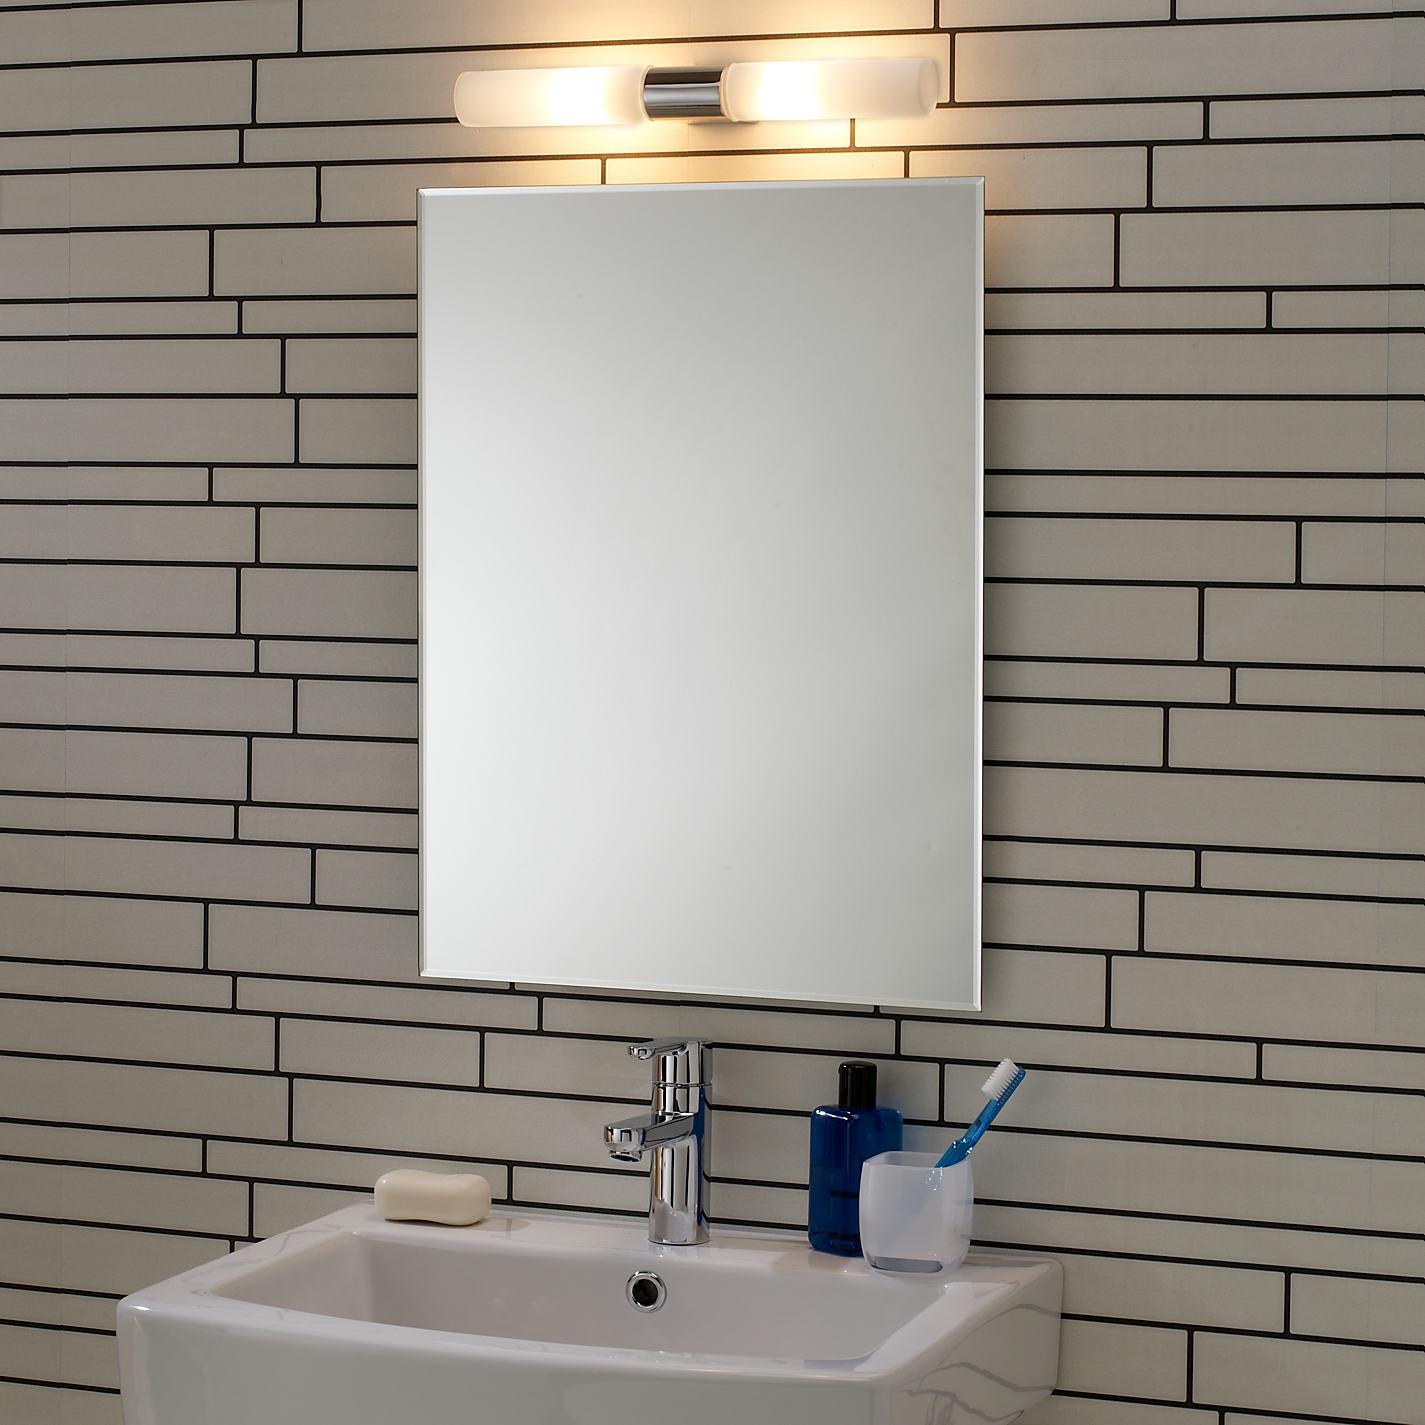 Extendable Bathroom Mirror With Light